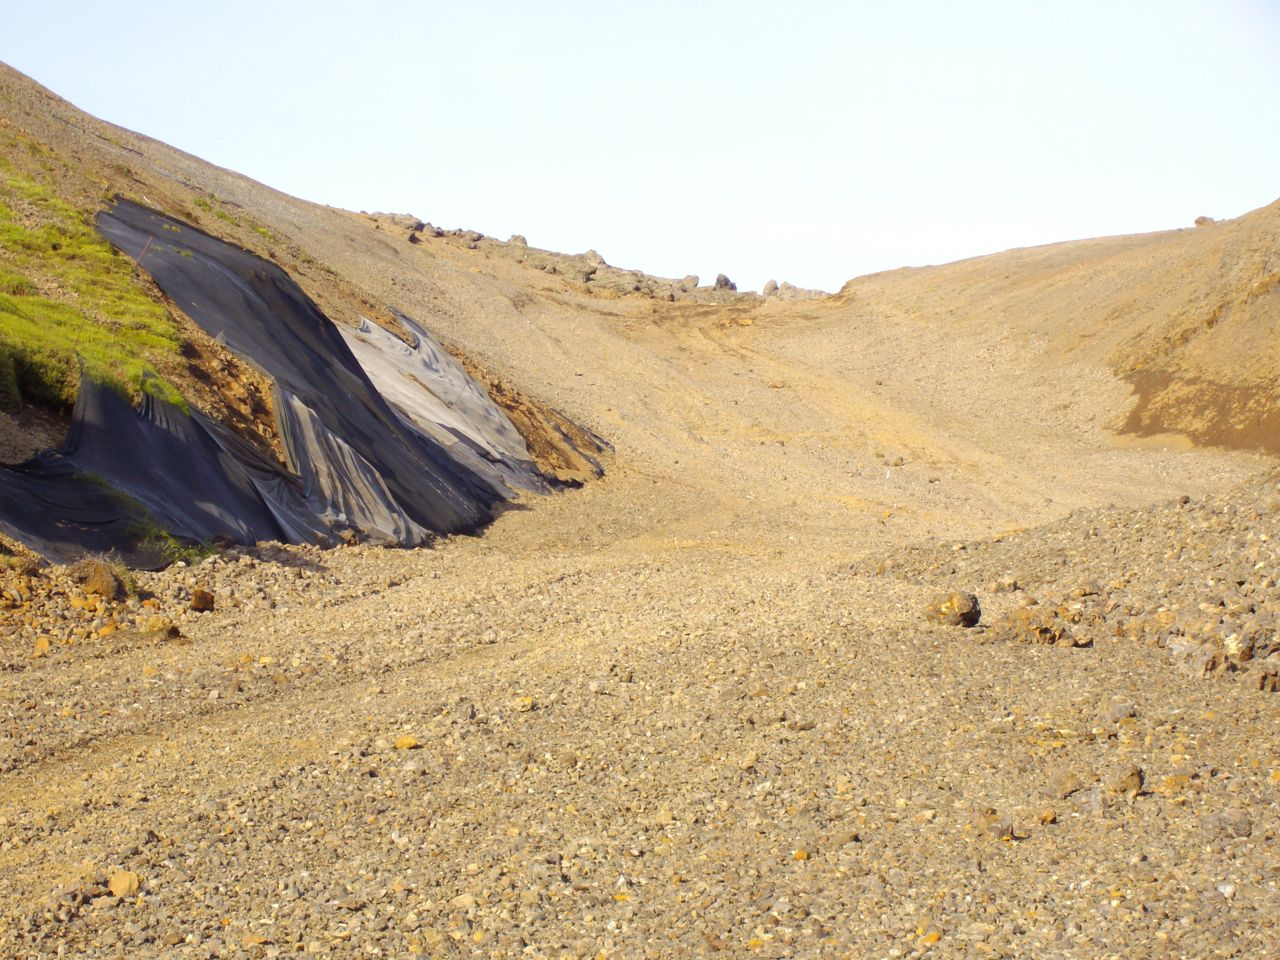 Destroyed mountain area